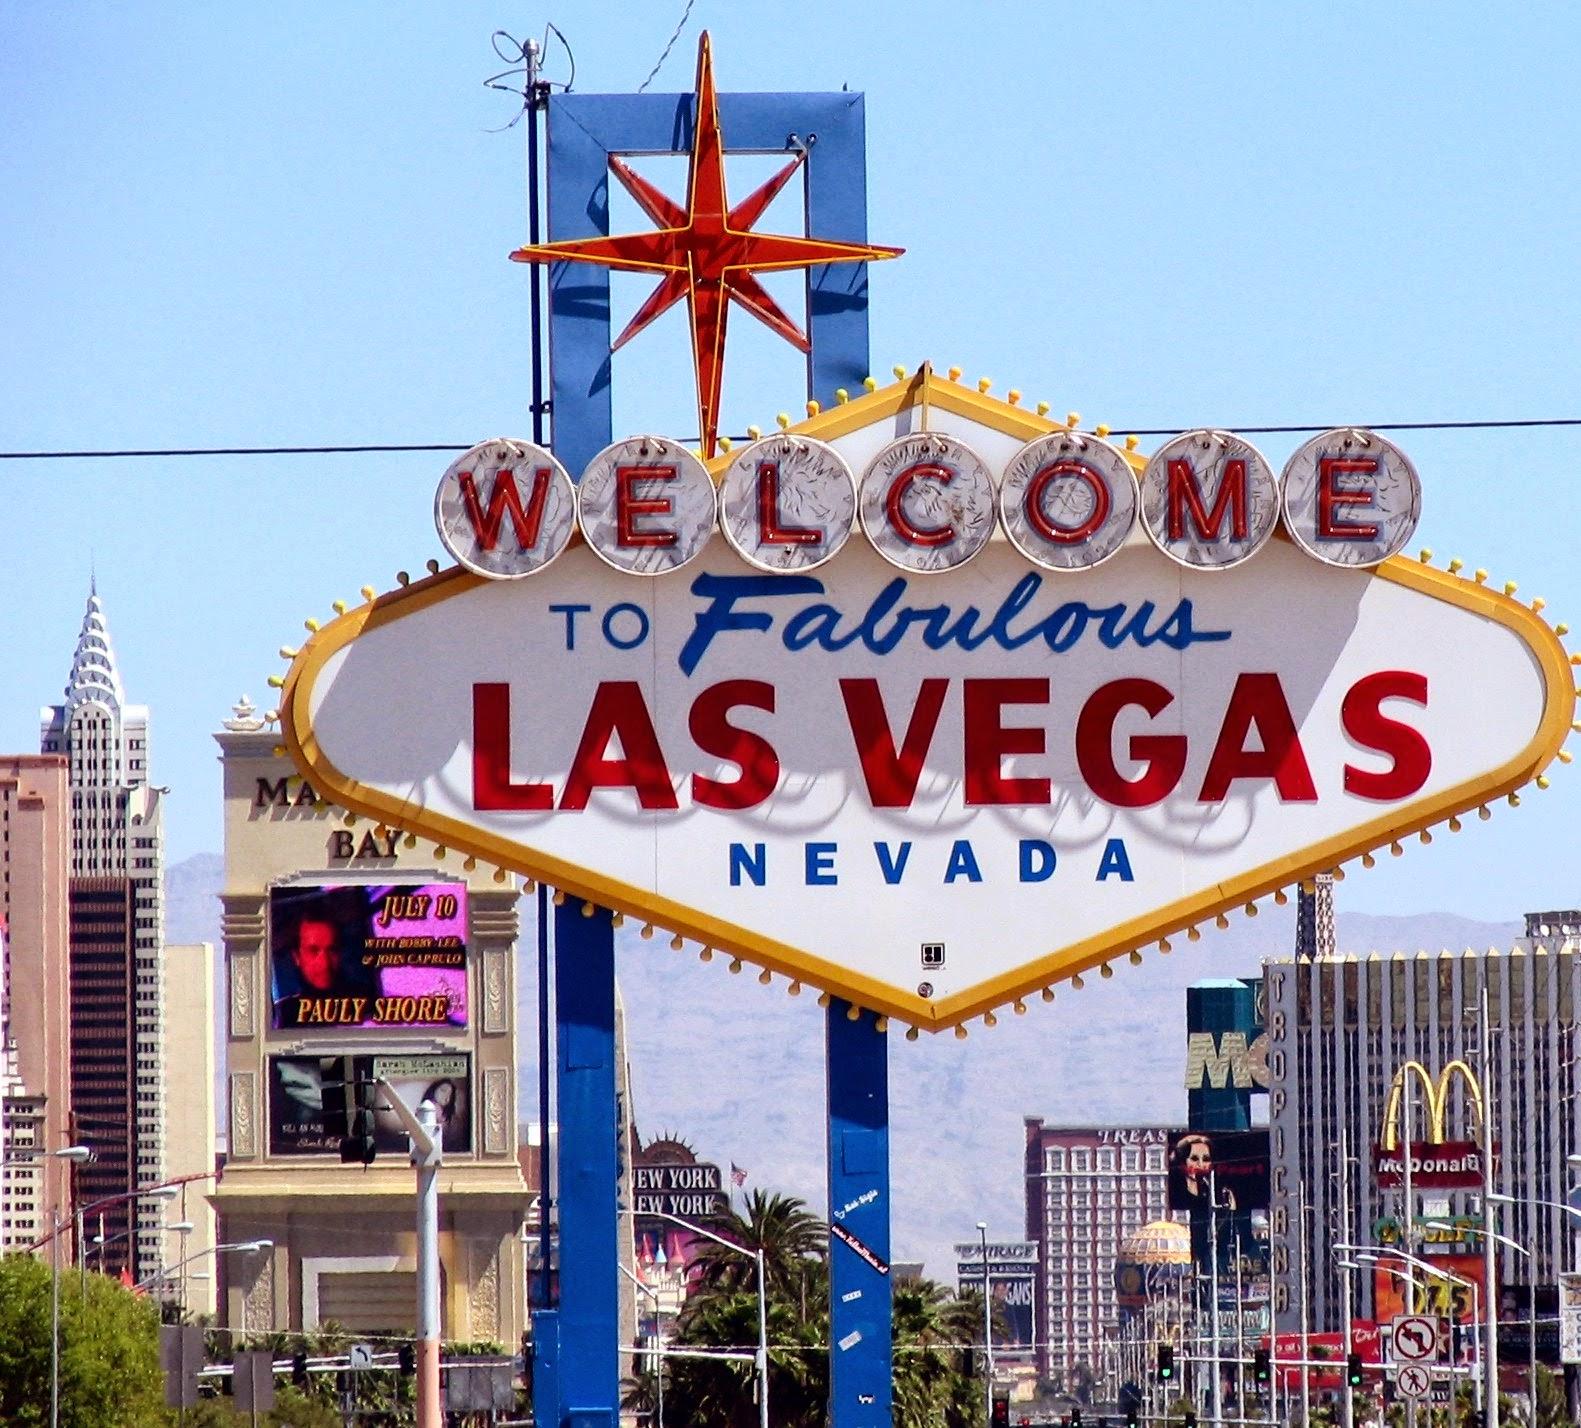 Vegas gambling stories casinoguide play poker-stars